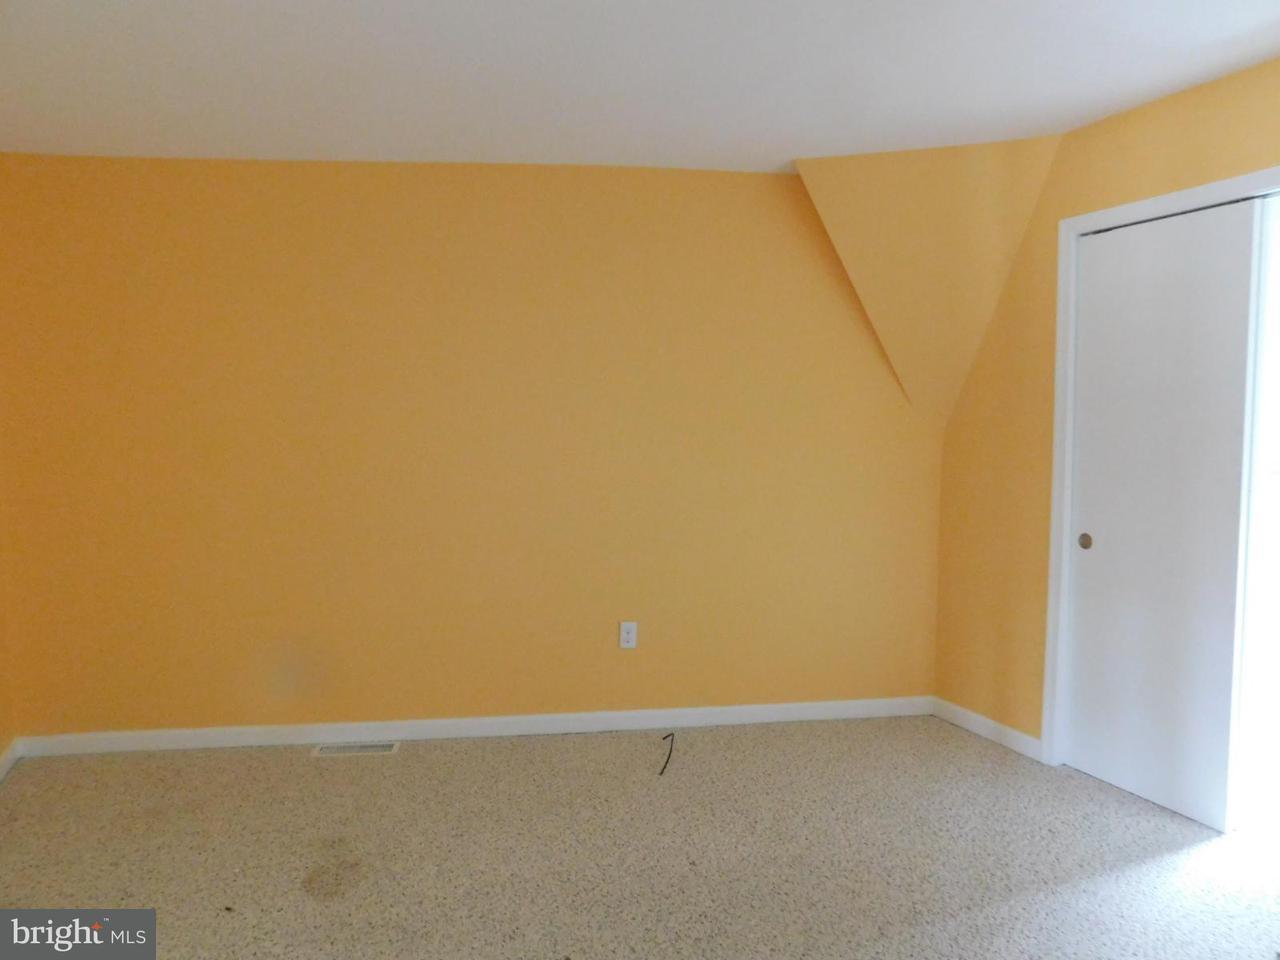 Additional photo for property listing at 5220 David Greene Road 5220 David Greene Road Cambridge, Мэриленд 21613 Соединенные Штаты